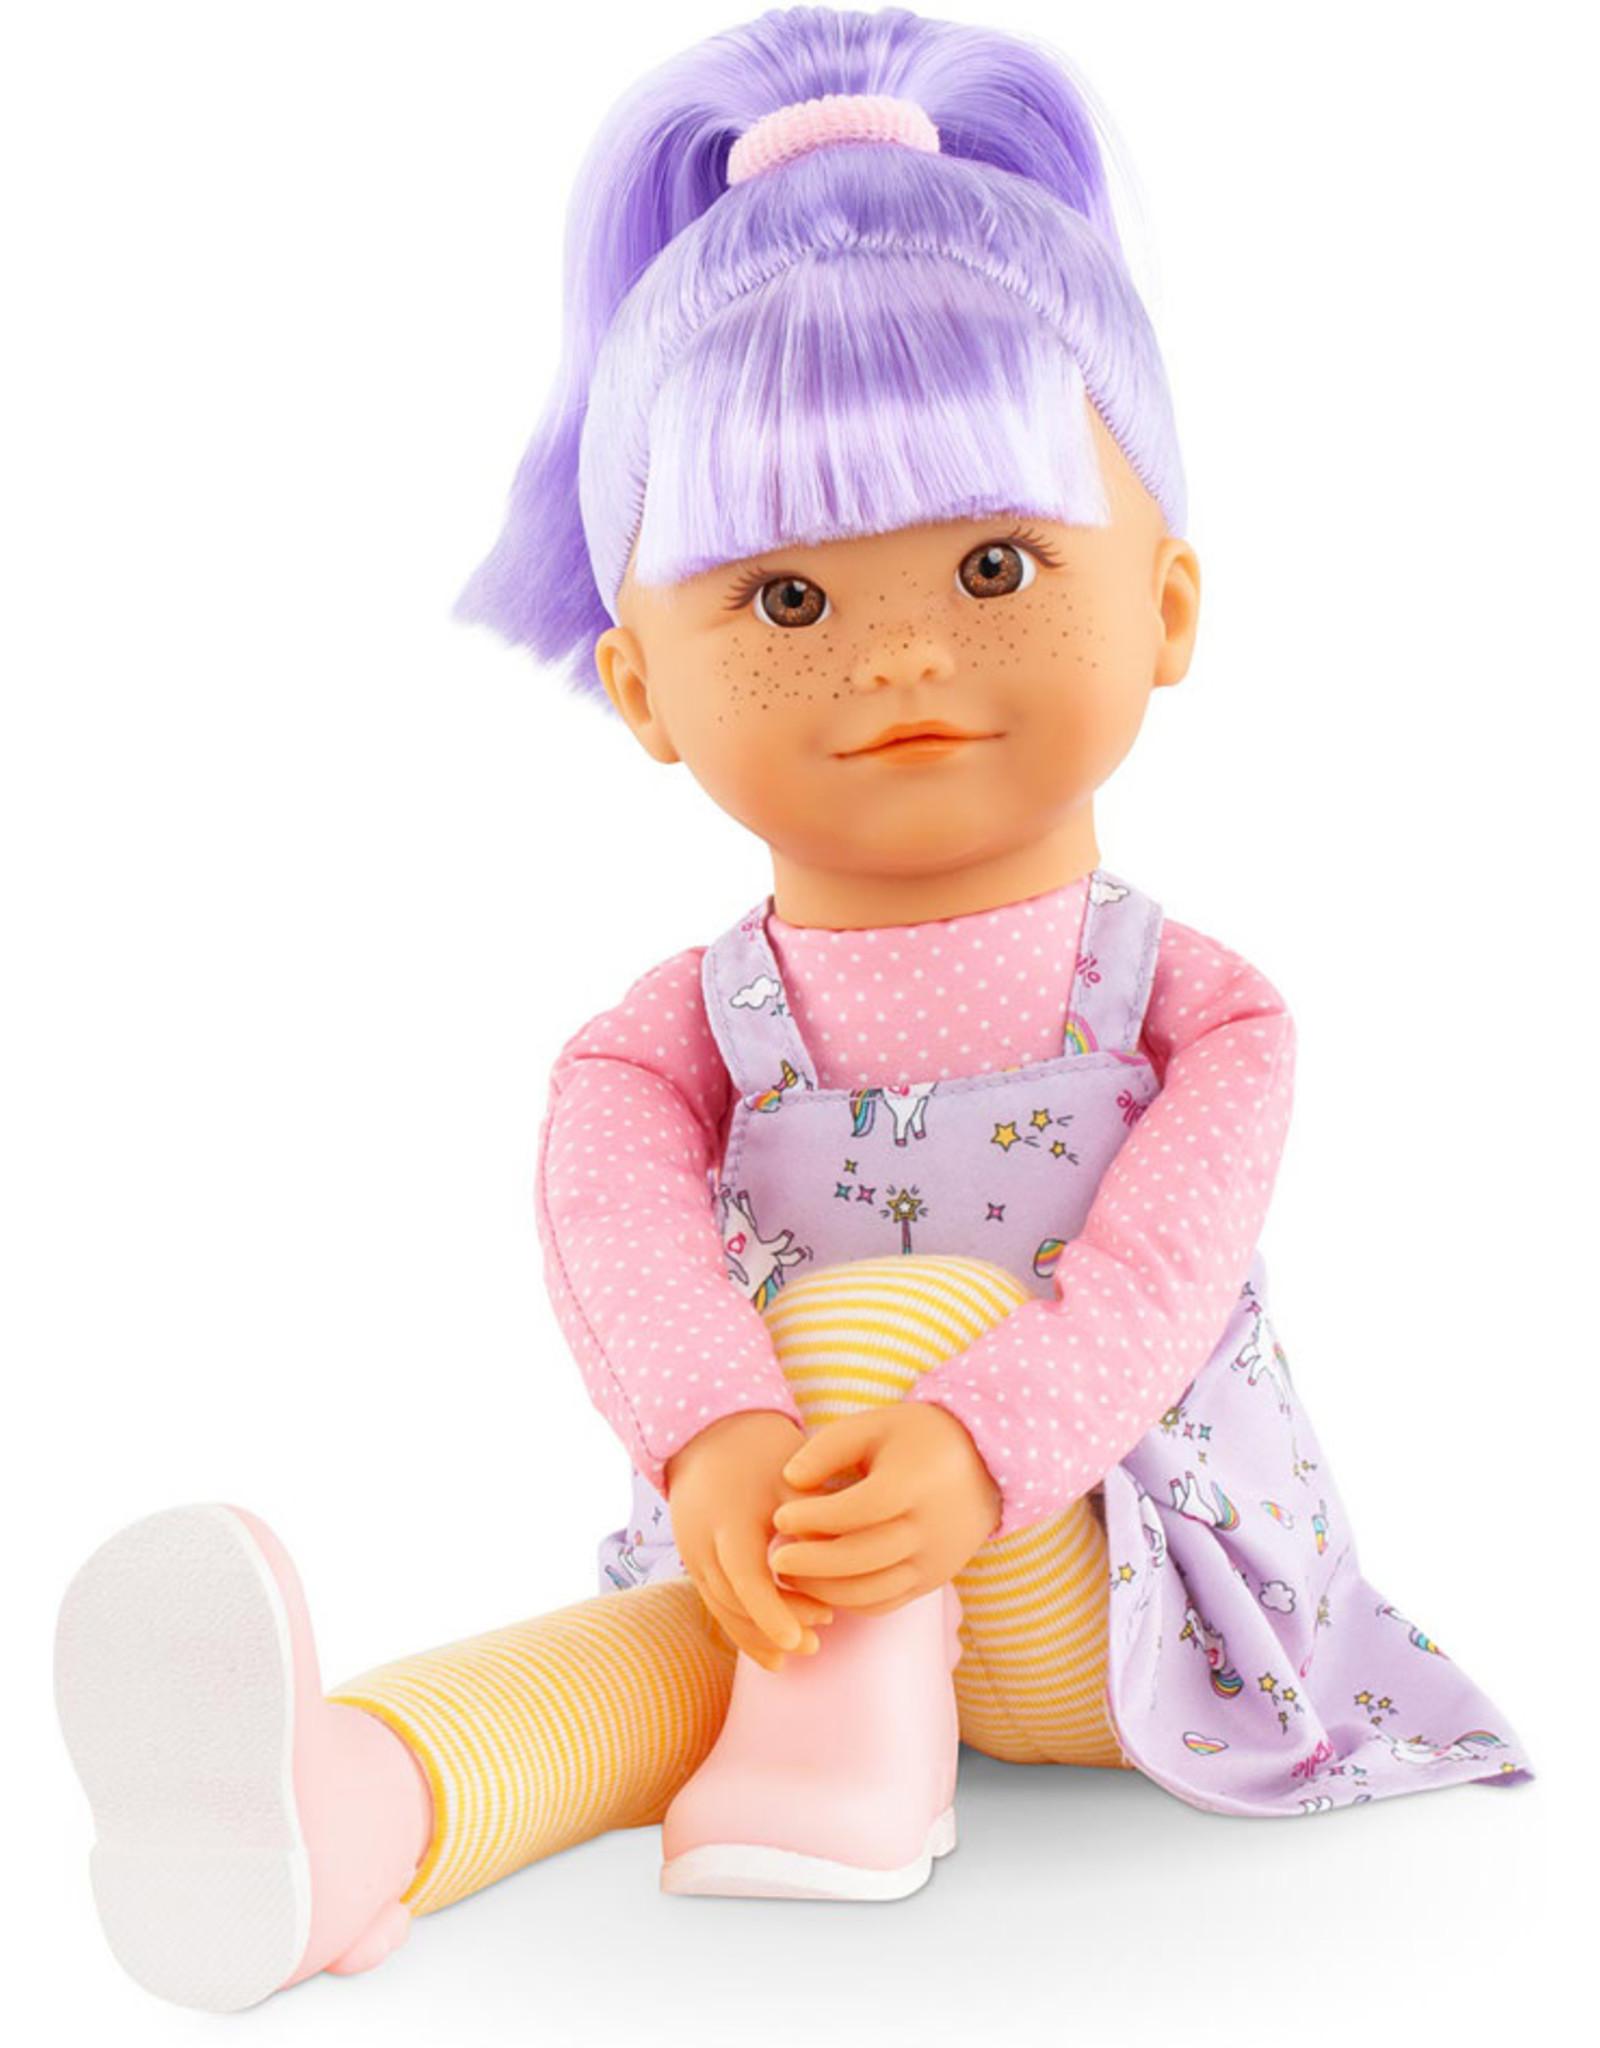 Corolle Corolle Rainbow Doll - Iris